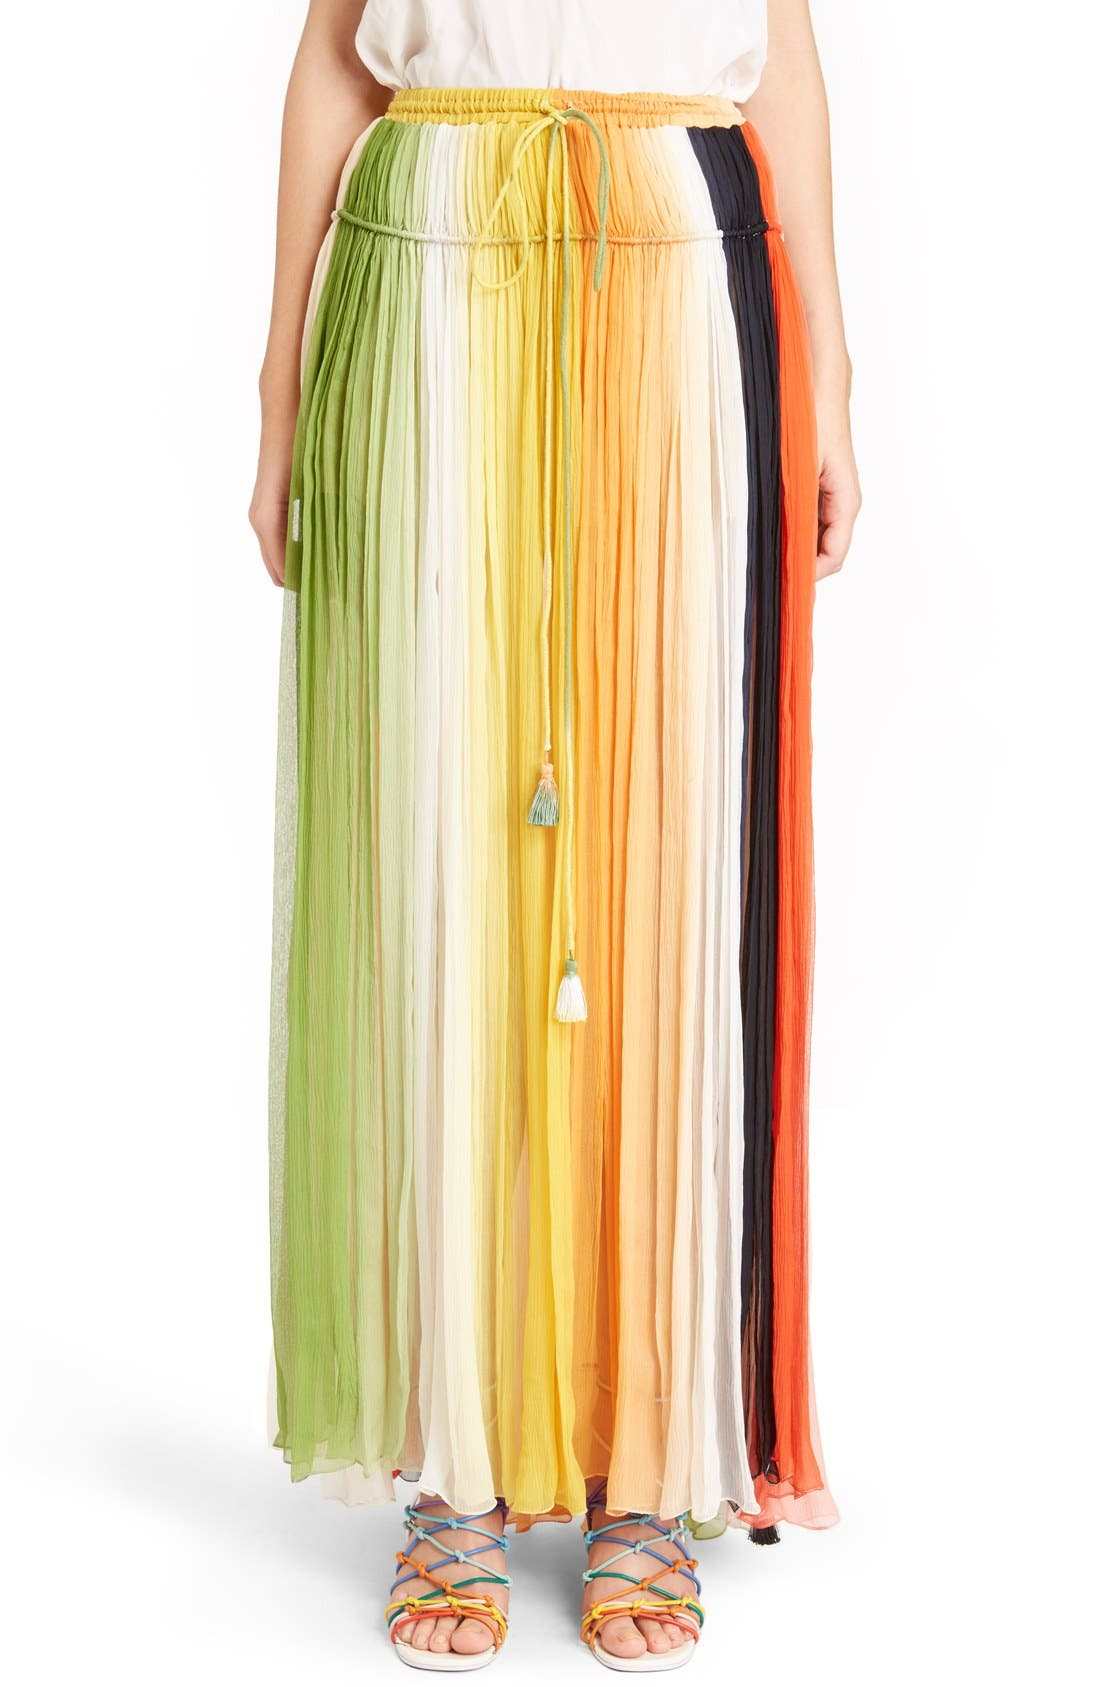 Main Image - Chloé Stripe Pleated Silk Skirt with Tassels